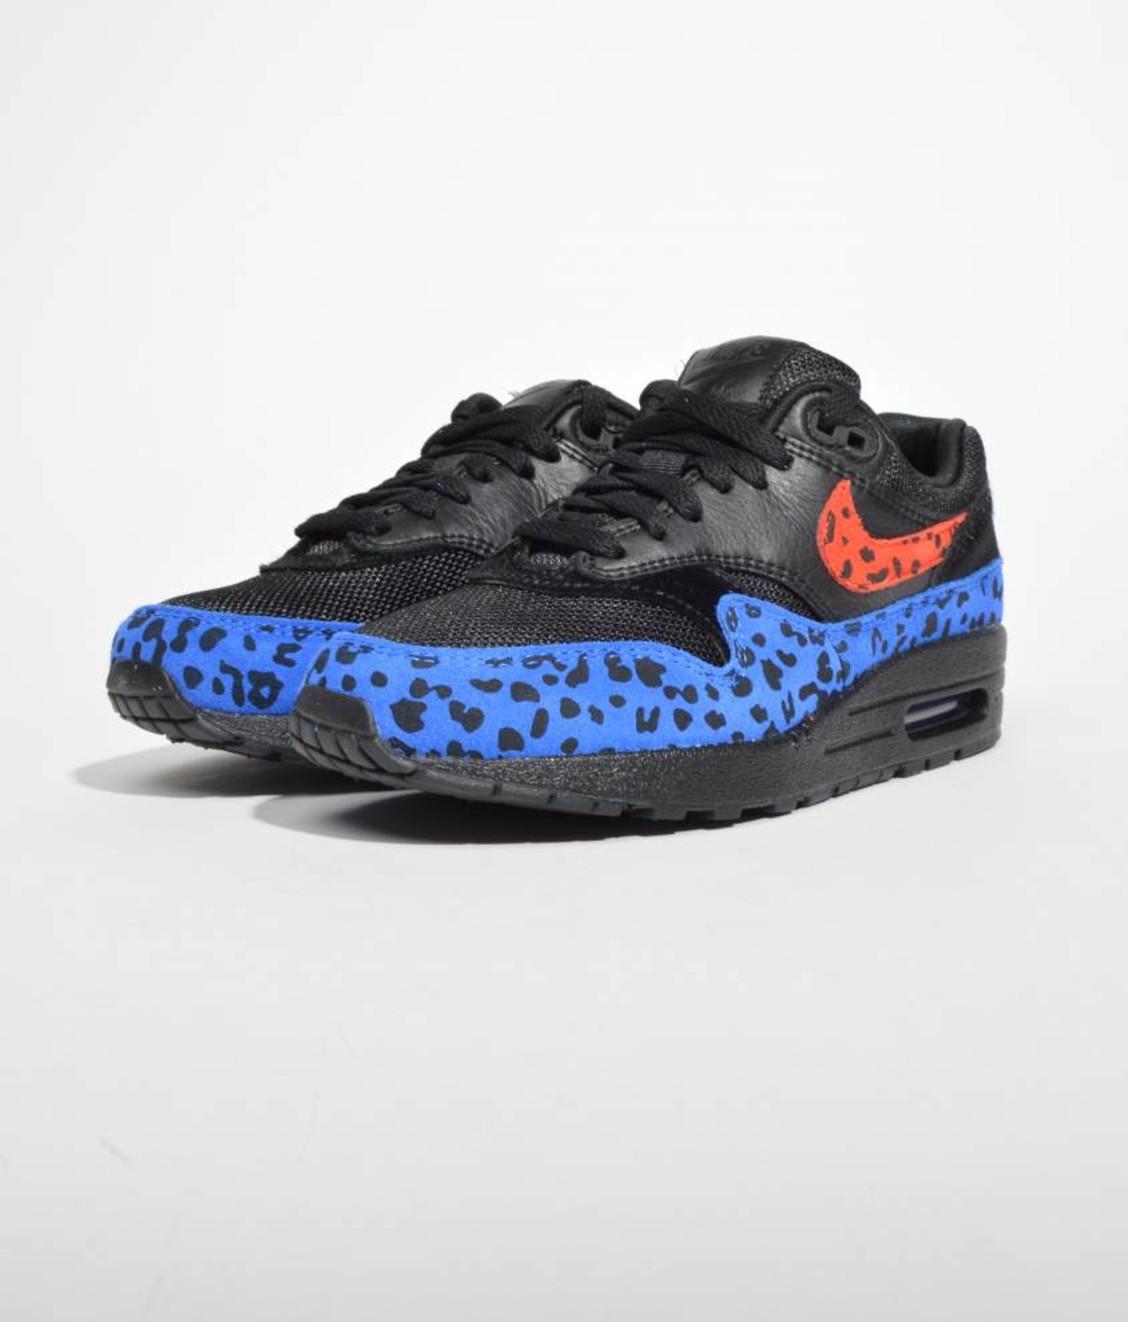 Nike Nike Air Max 1 Premium Black Habanero Red Leopard